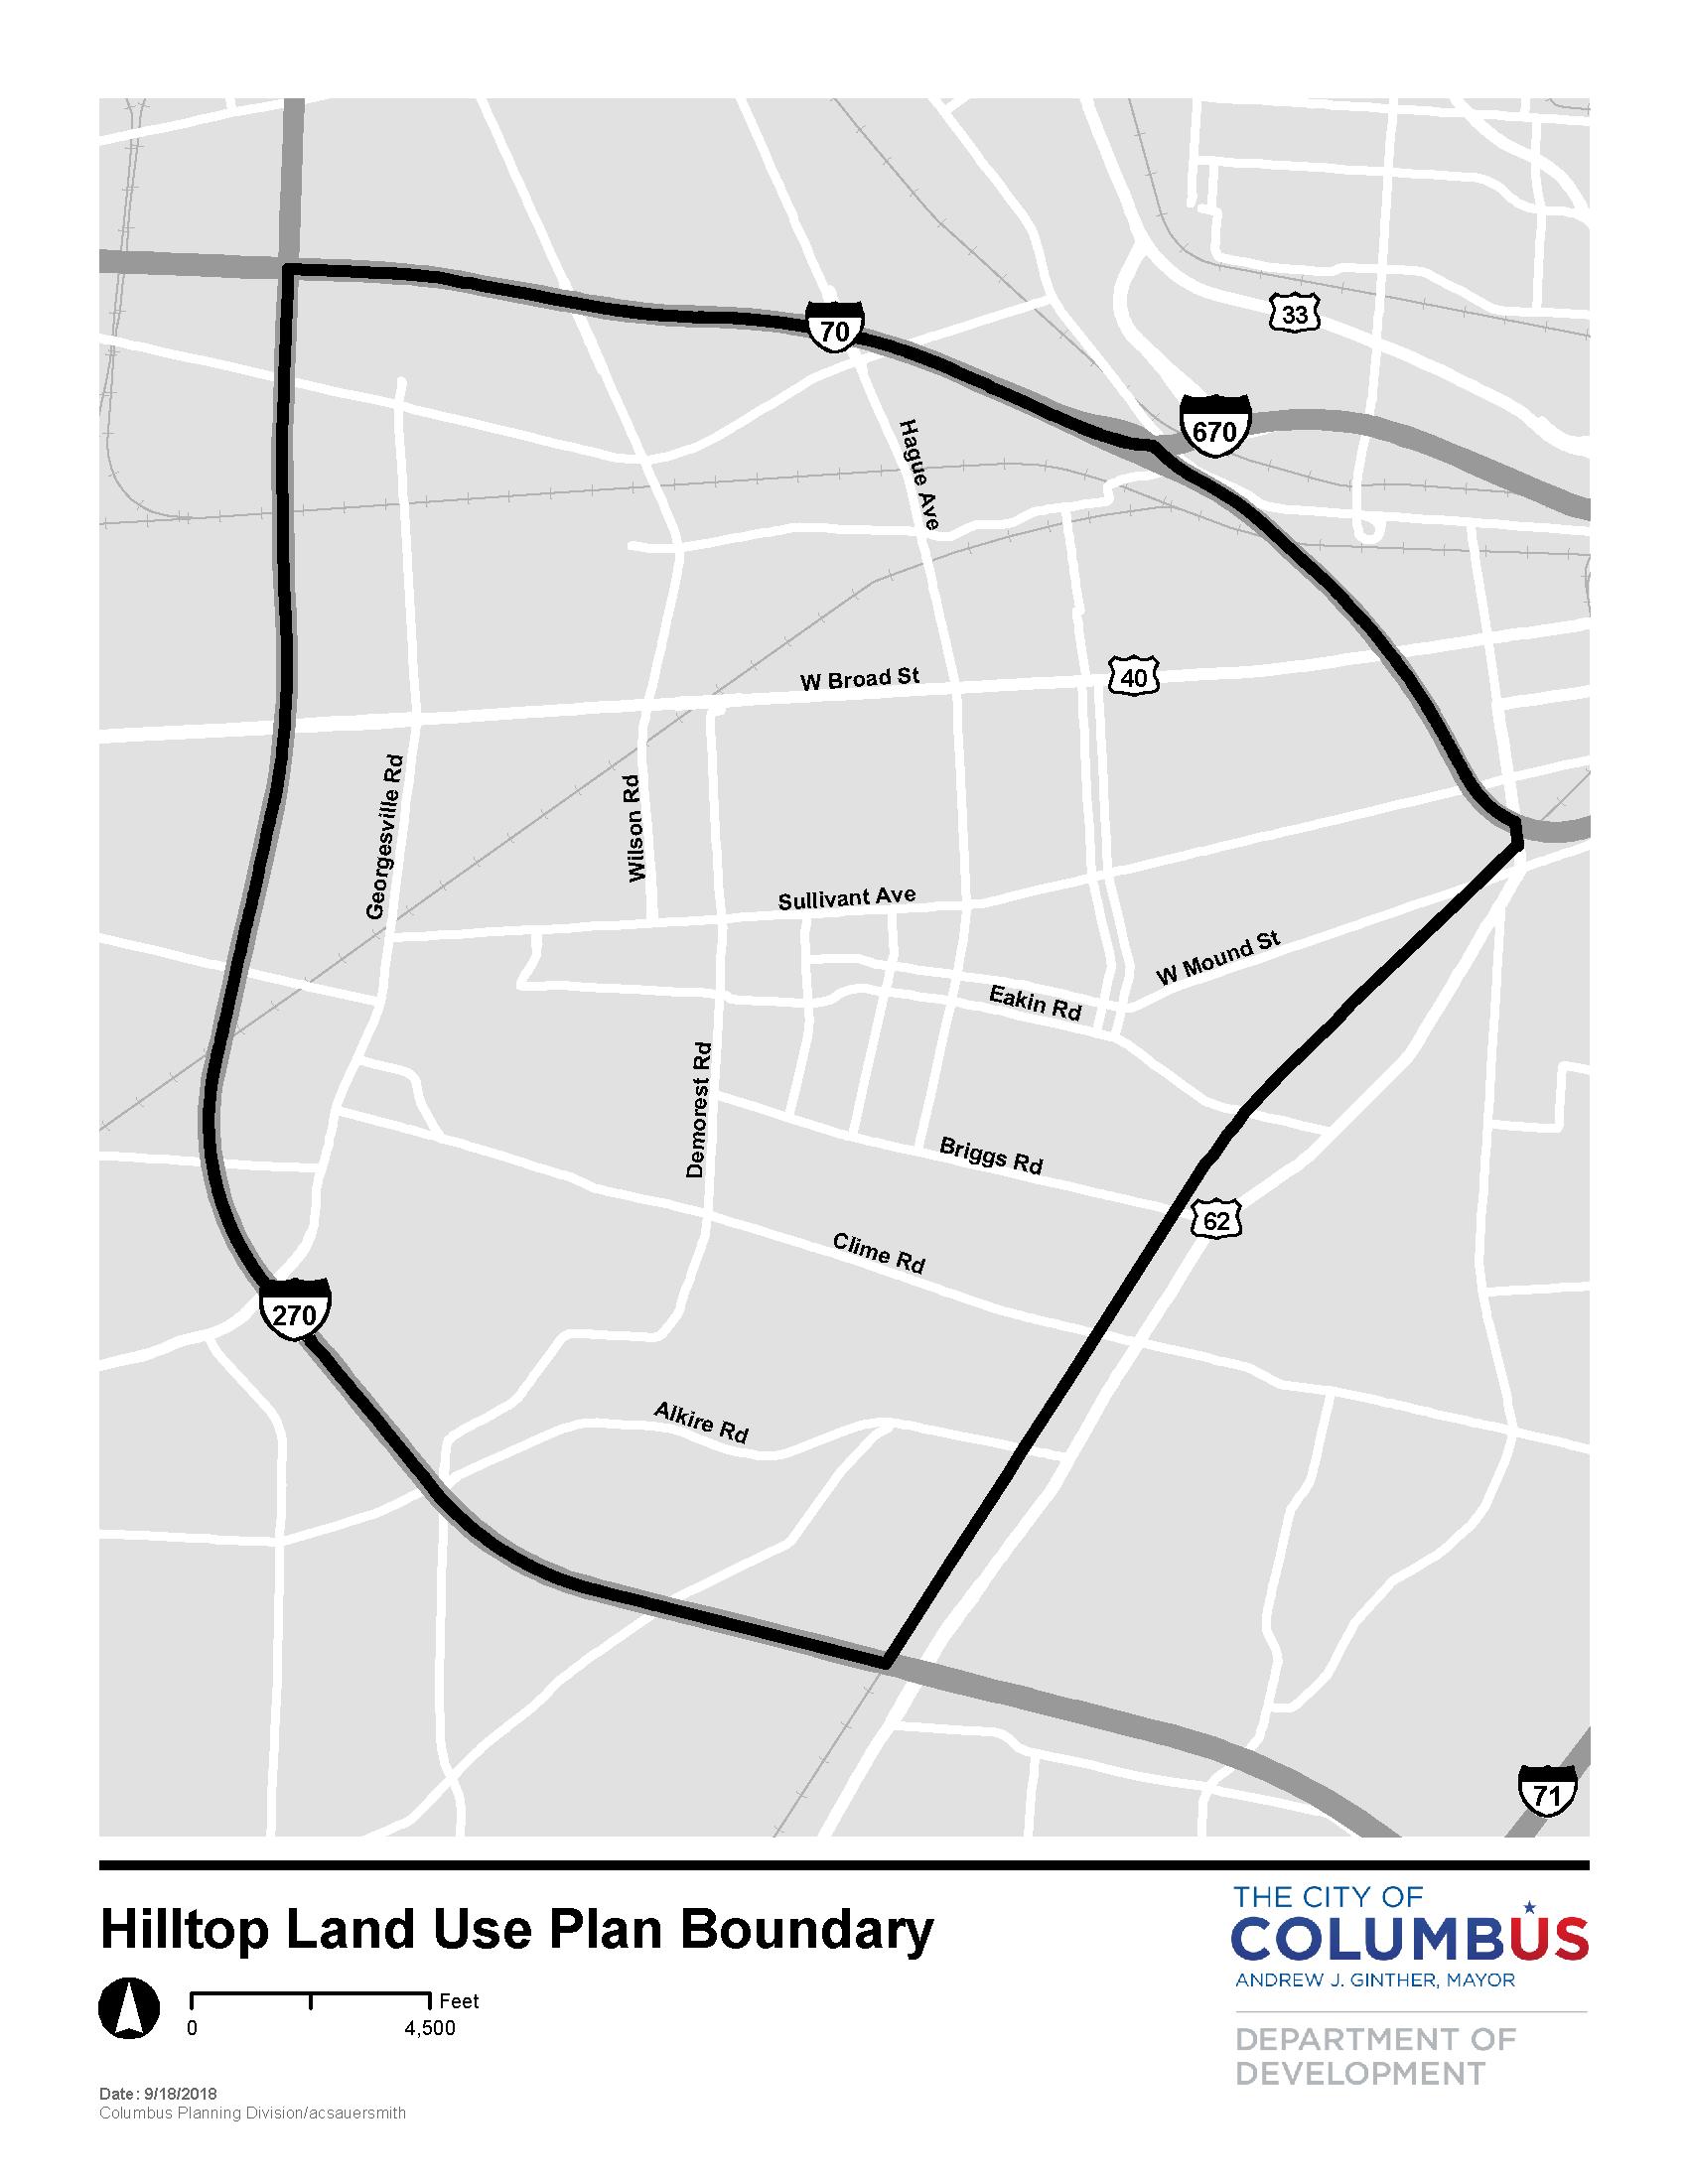 Hilltop Land Use Plan (2018-2019)